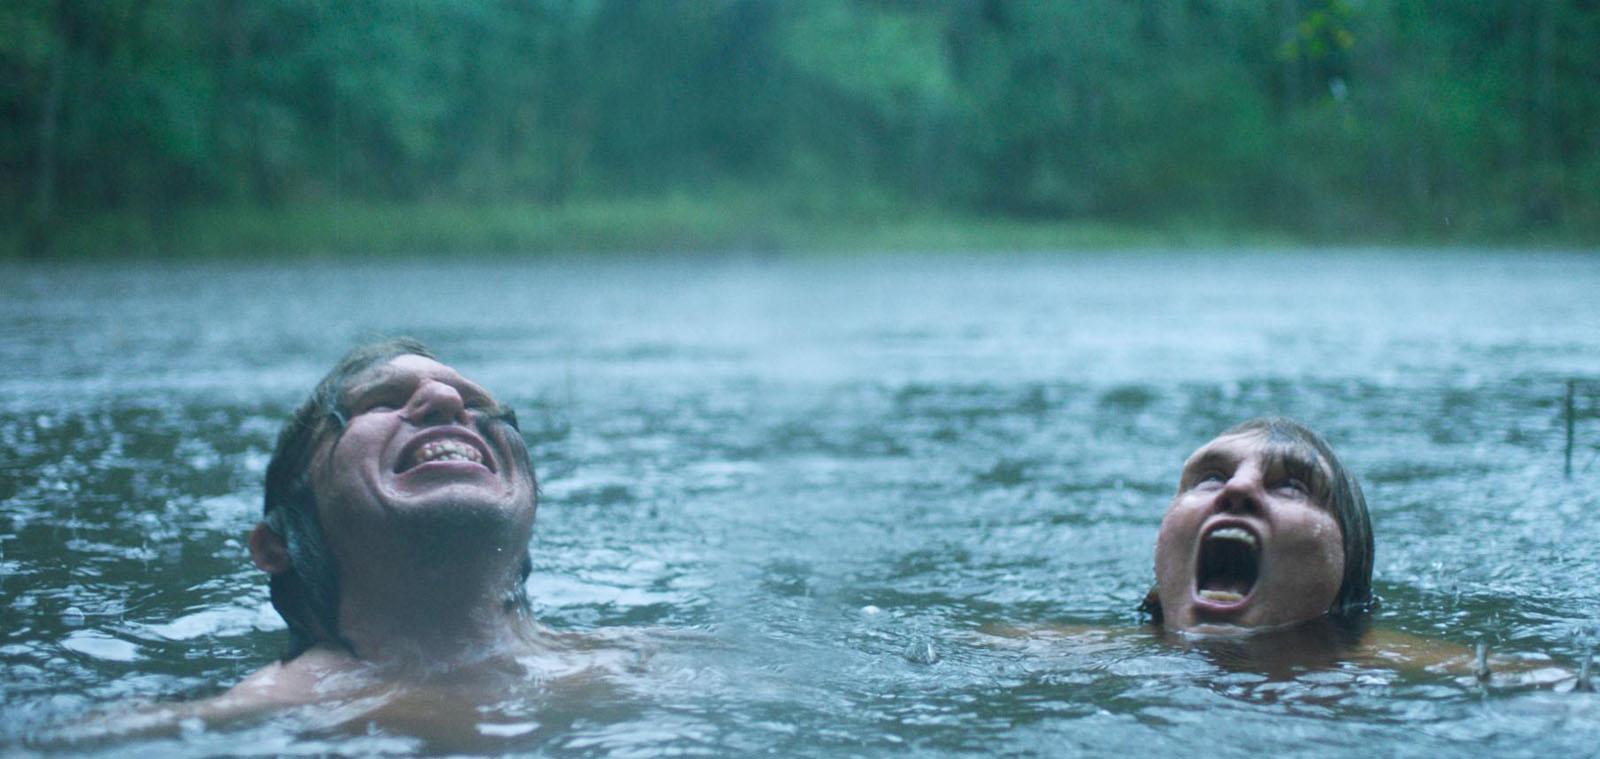 Eero Milonoff et Eva Melander dans Border à Un certain regard cannes 2018